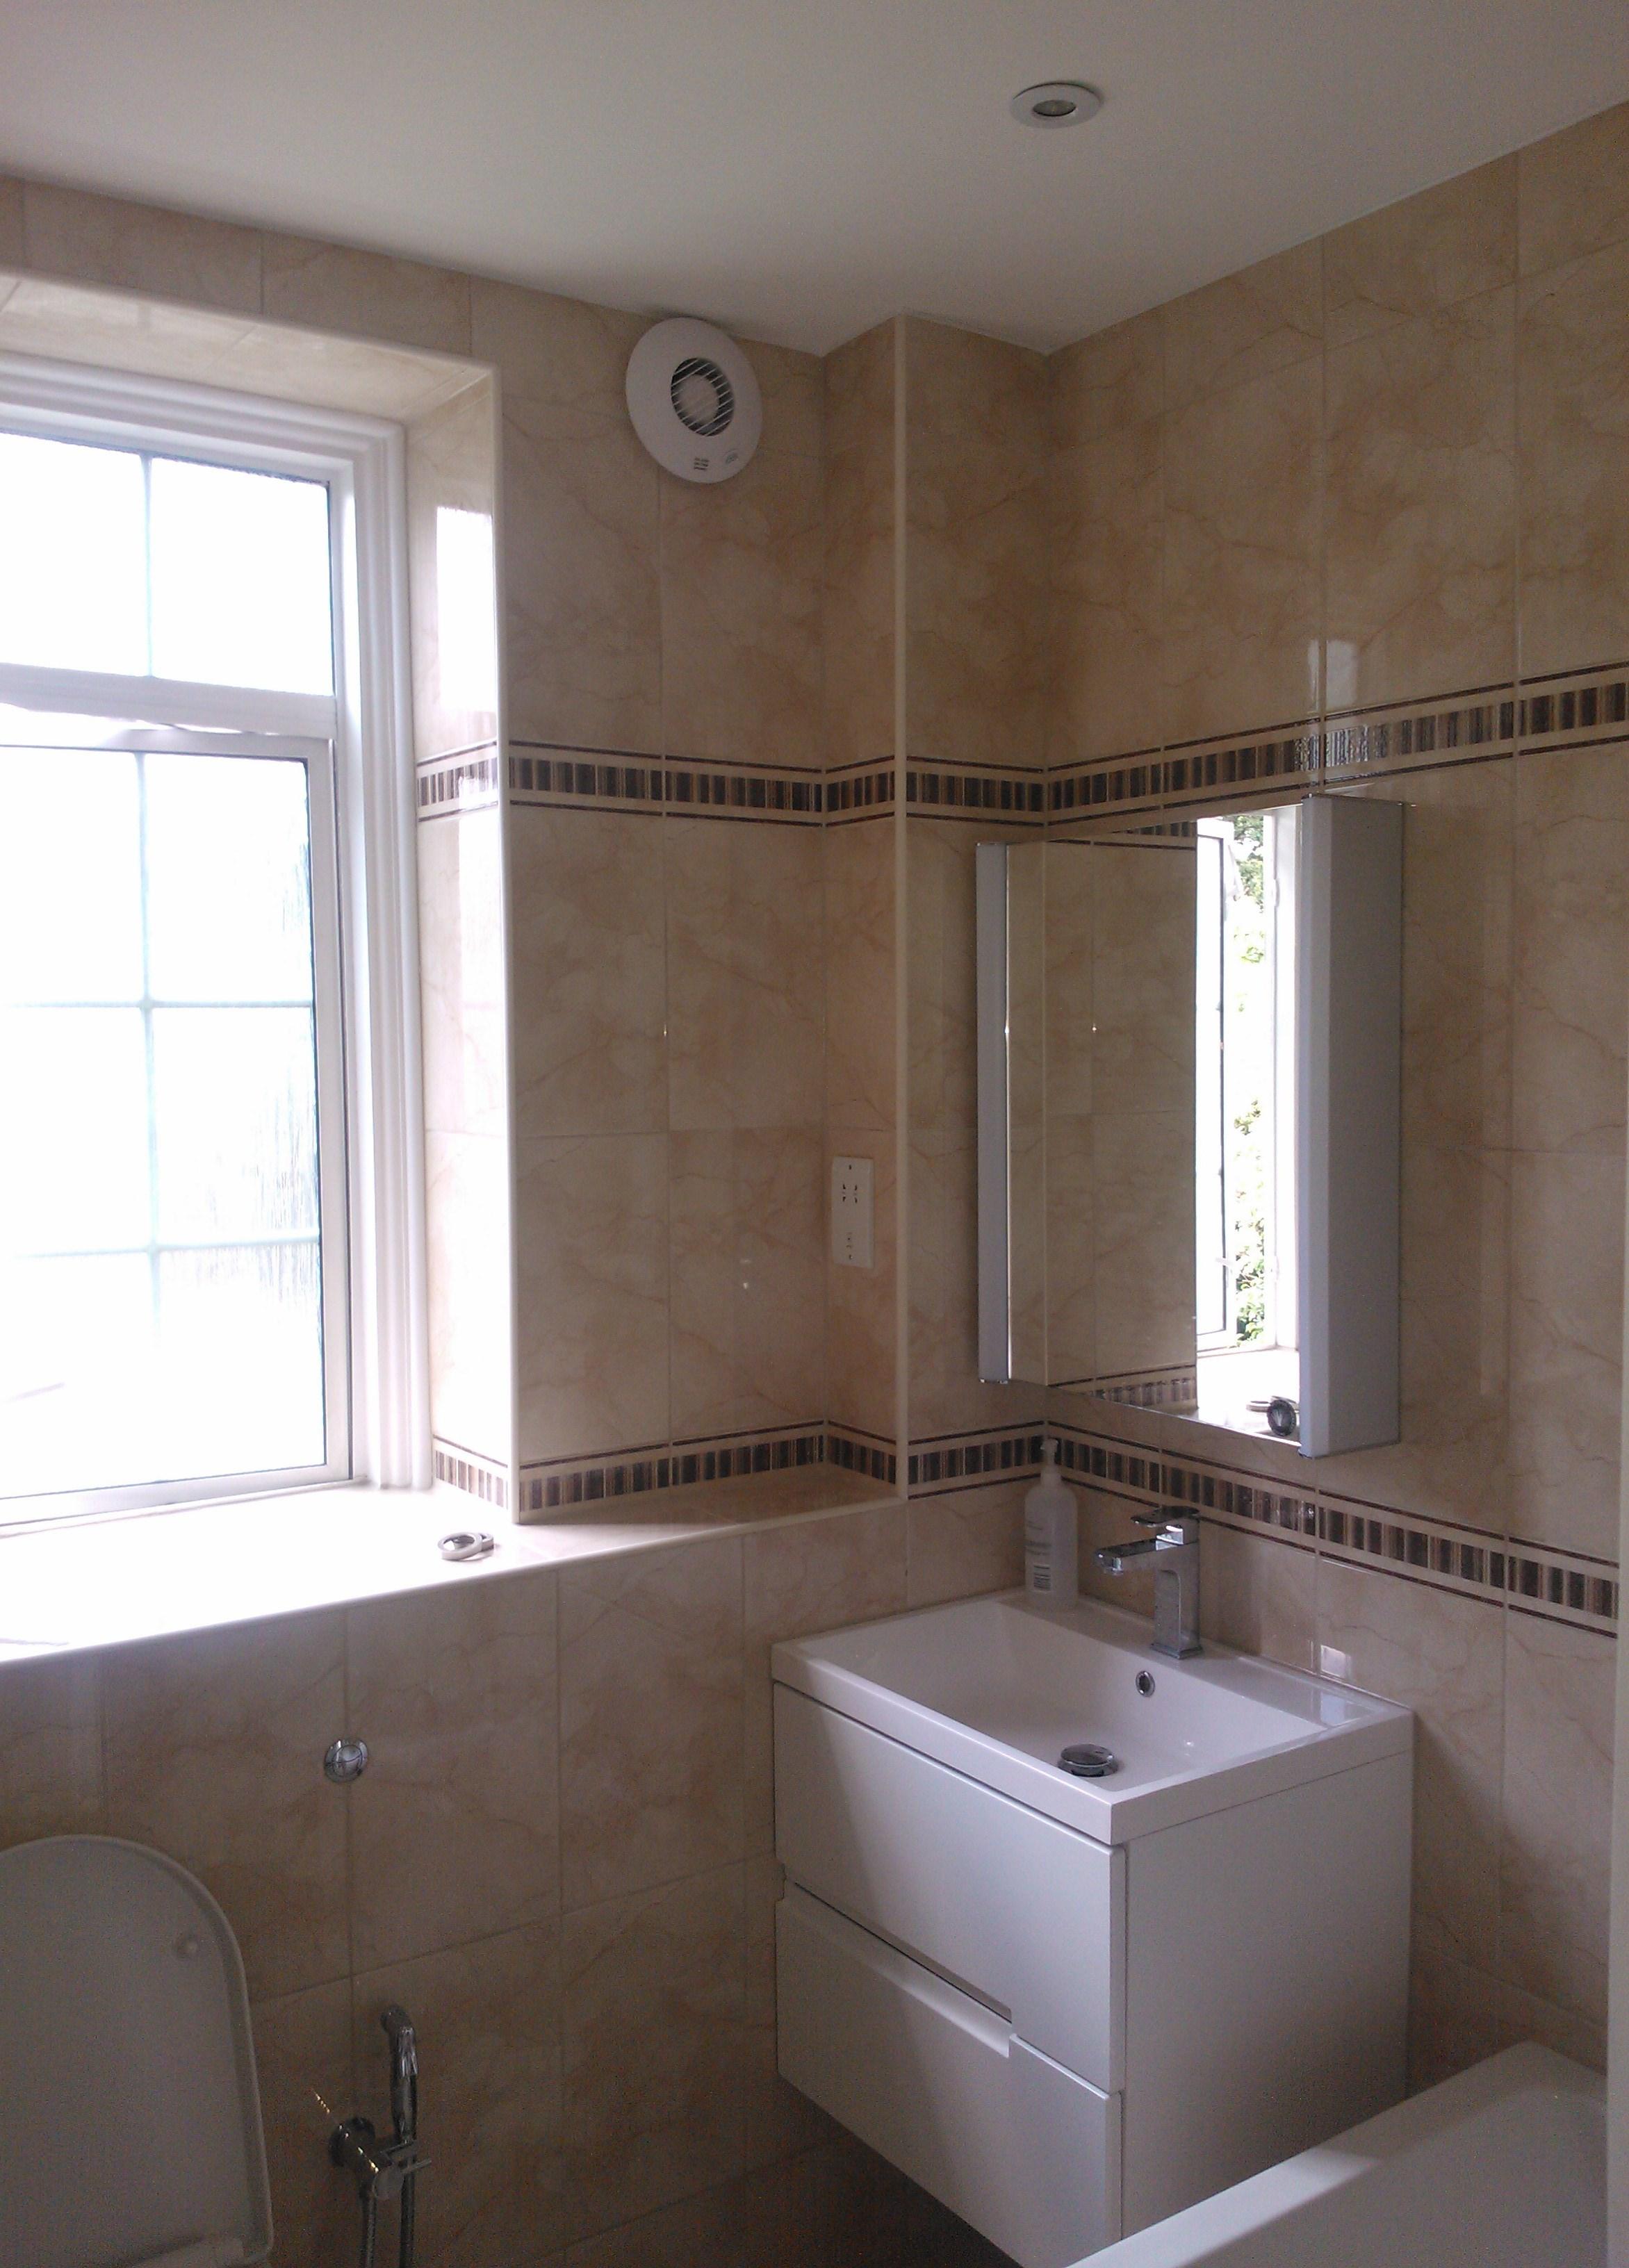 Finchley_Flat refurbishement_ (15)